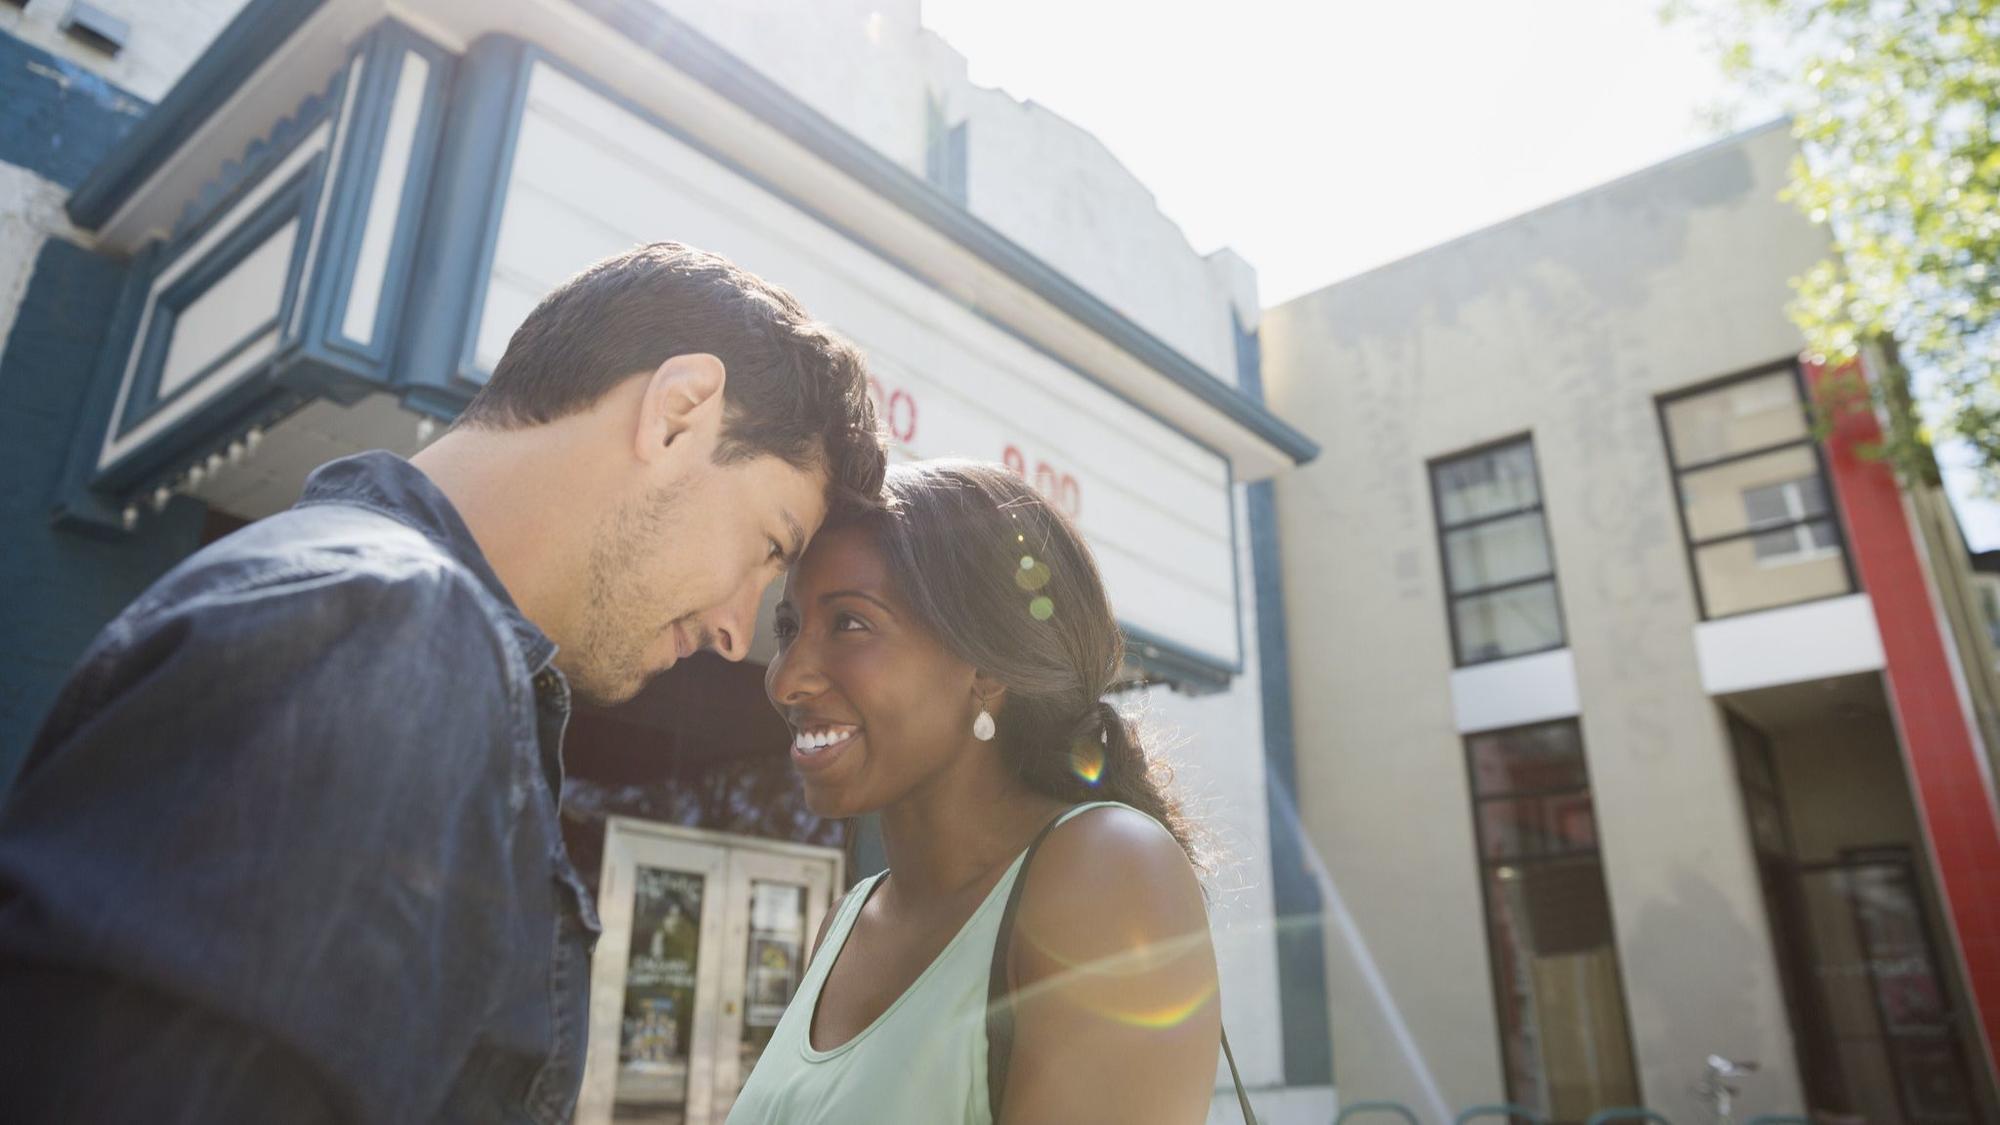 Your behavior caucasian dating interracial towards something is